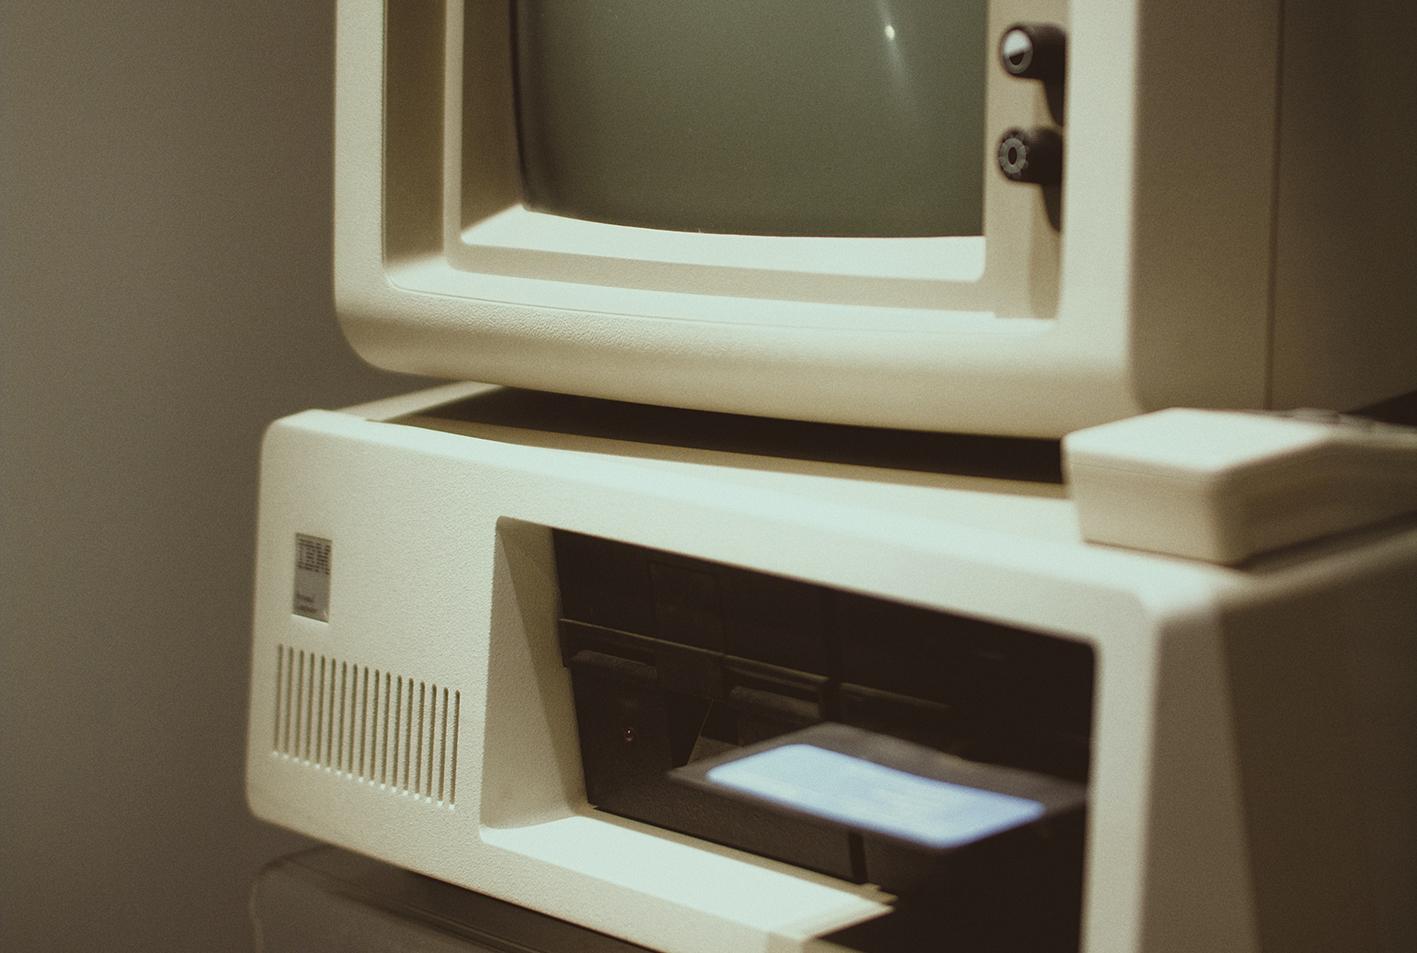 Vintage computer met floppydisk